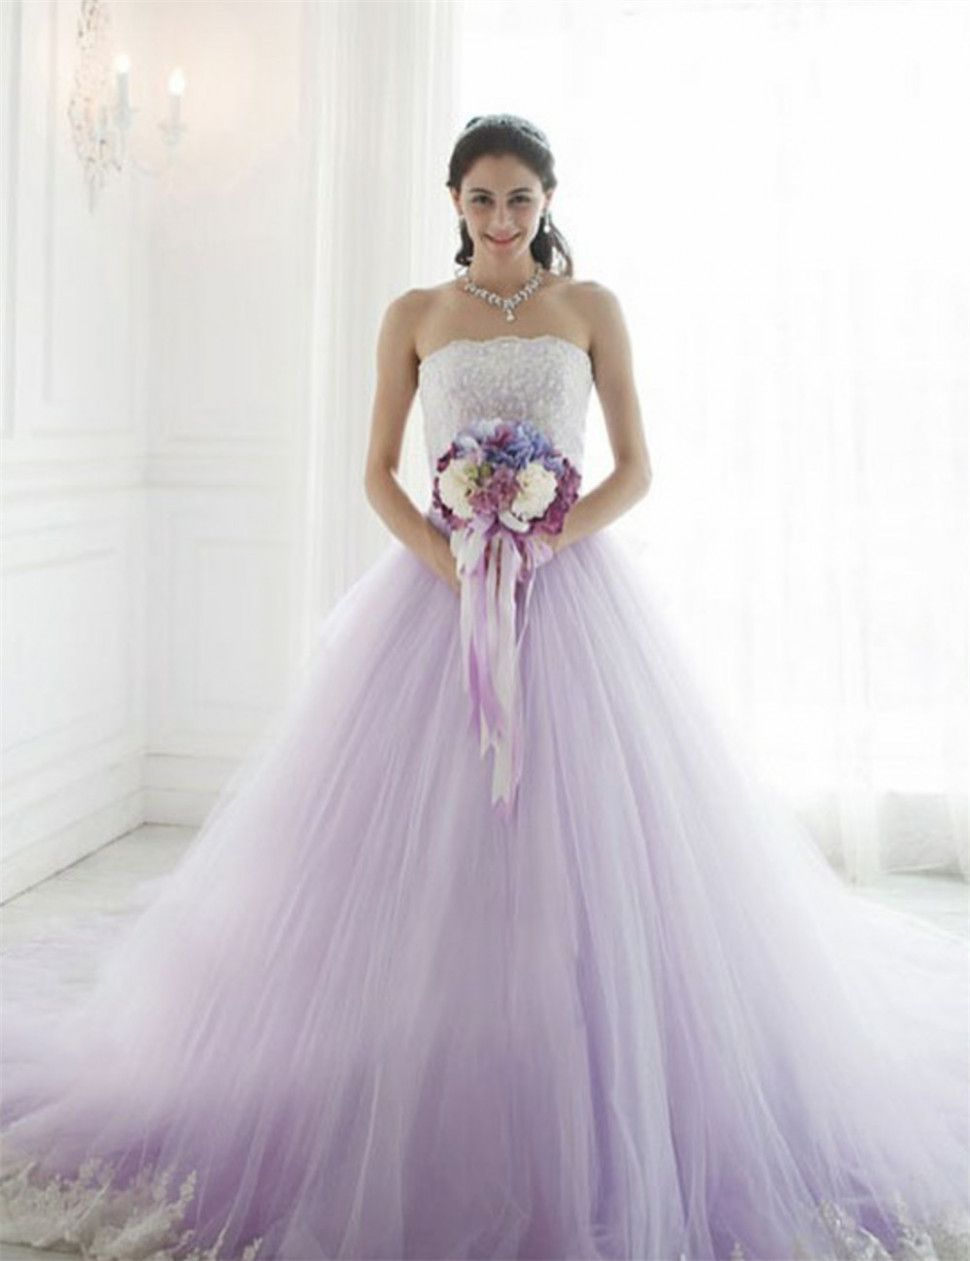 Purple Lace Wedding Dress Wedding Ideas Purplewedding Gowndressideas Purple Wedding Gown Purple Wedding Dress Colored Wedding Dresses [ 1261 x 970 Pixel ]